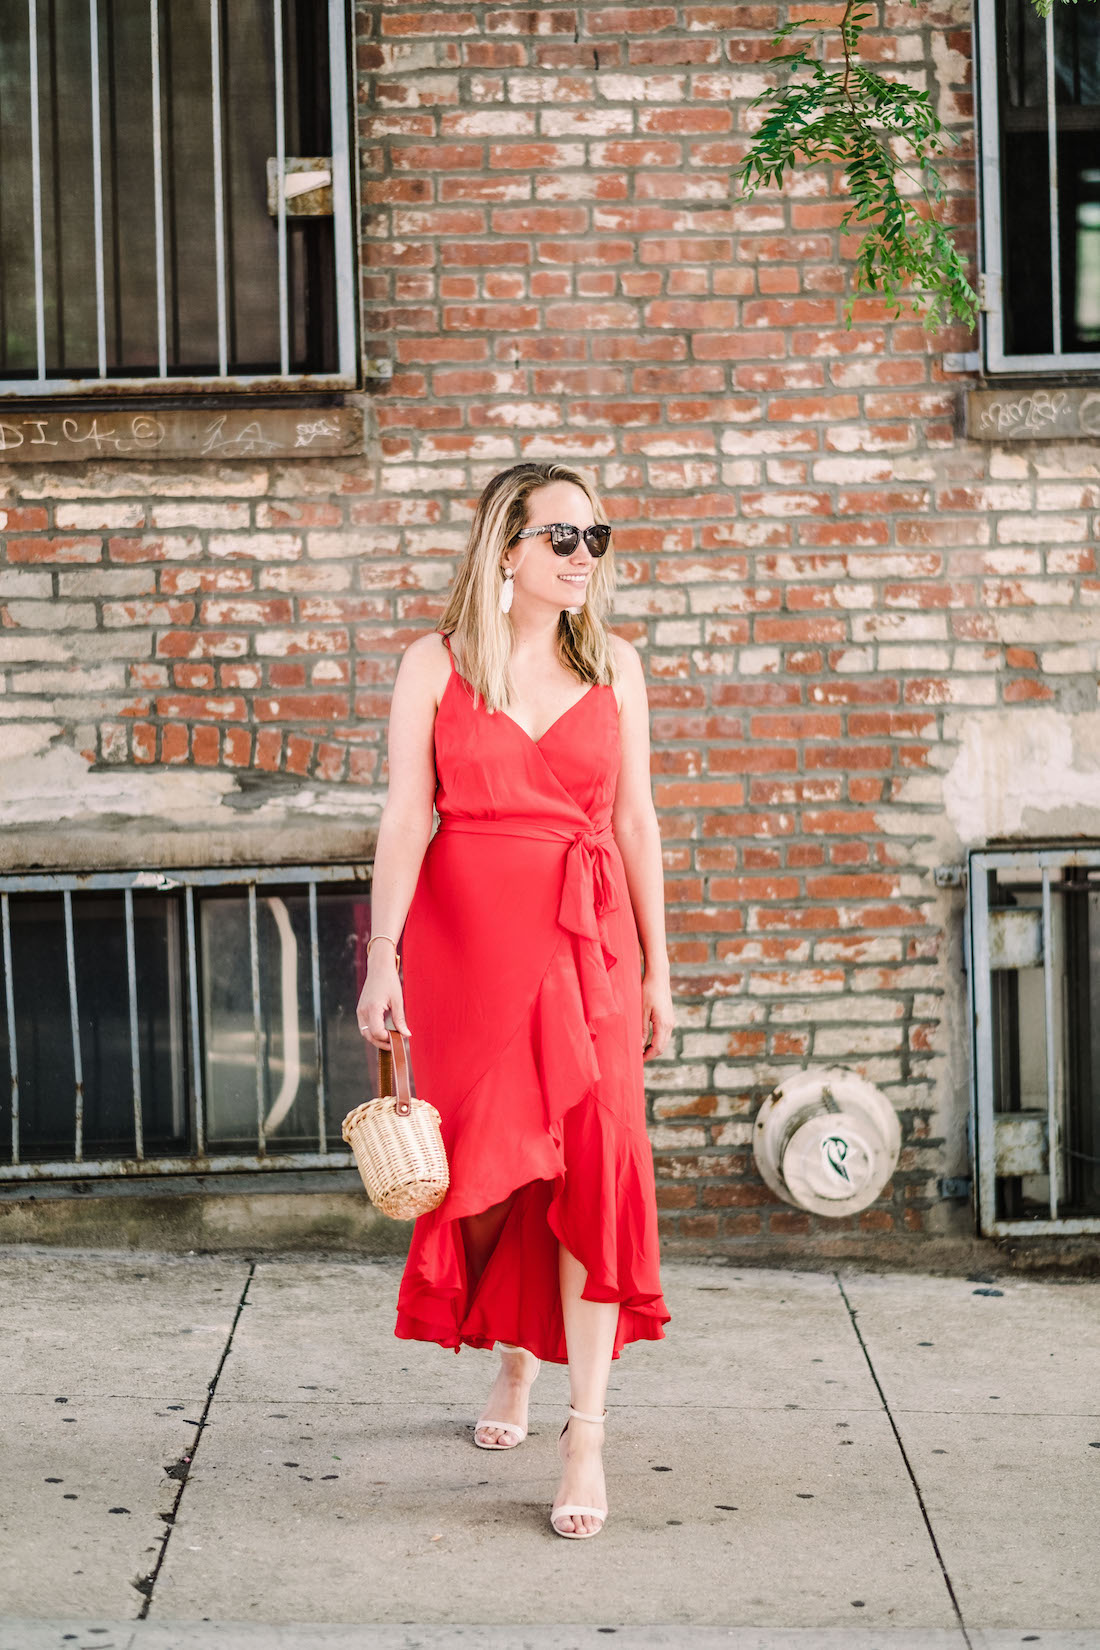 J.Crew Red Dress // BaubleBar Earrings // Steve Madden Sandals // Polaroid Sunglasses // Lindroth Design Mini Birkin